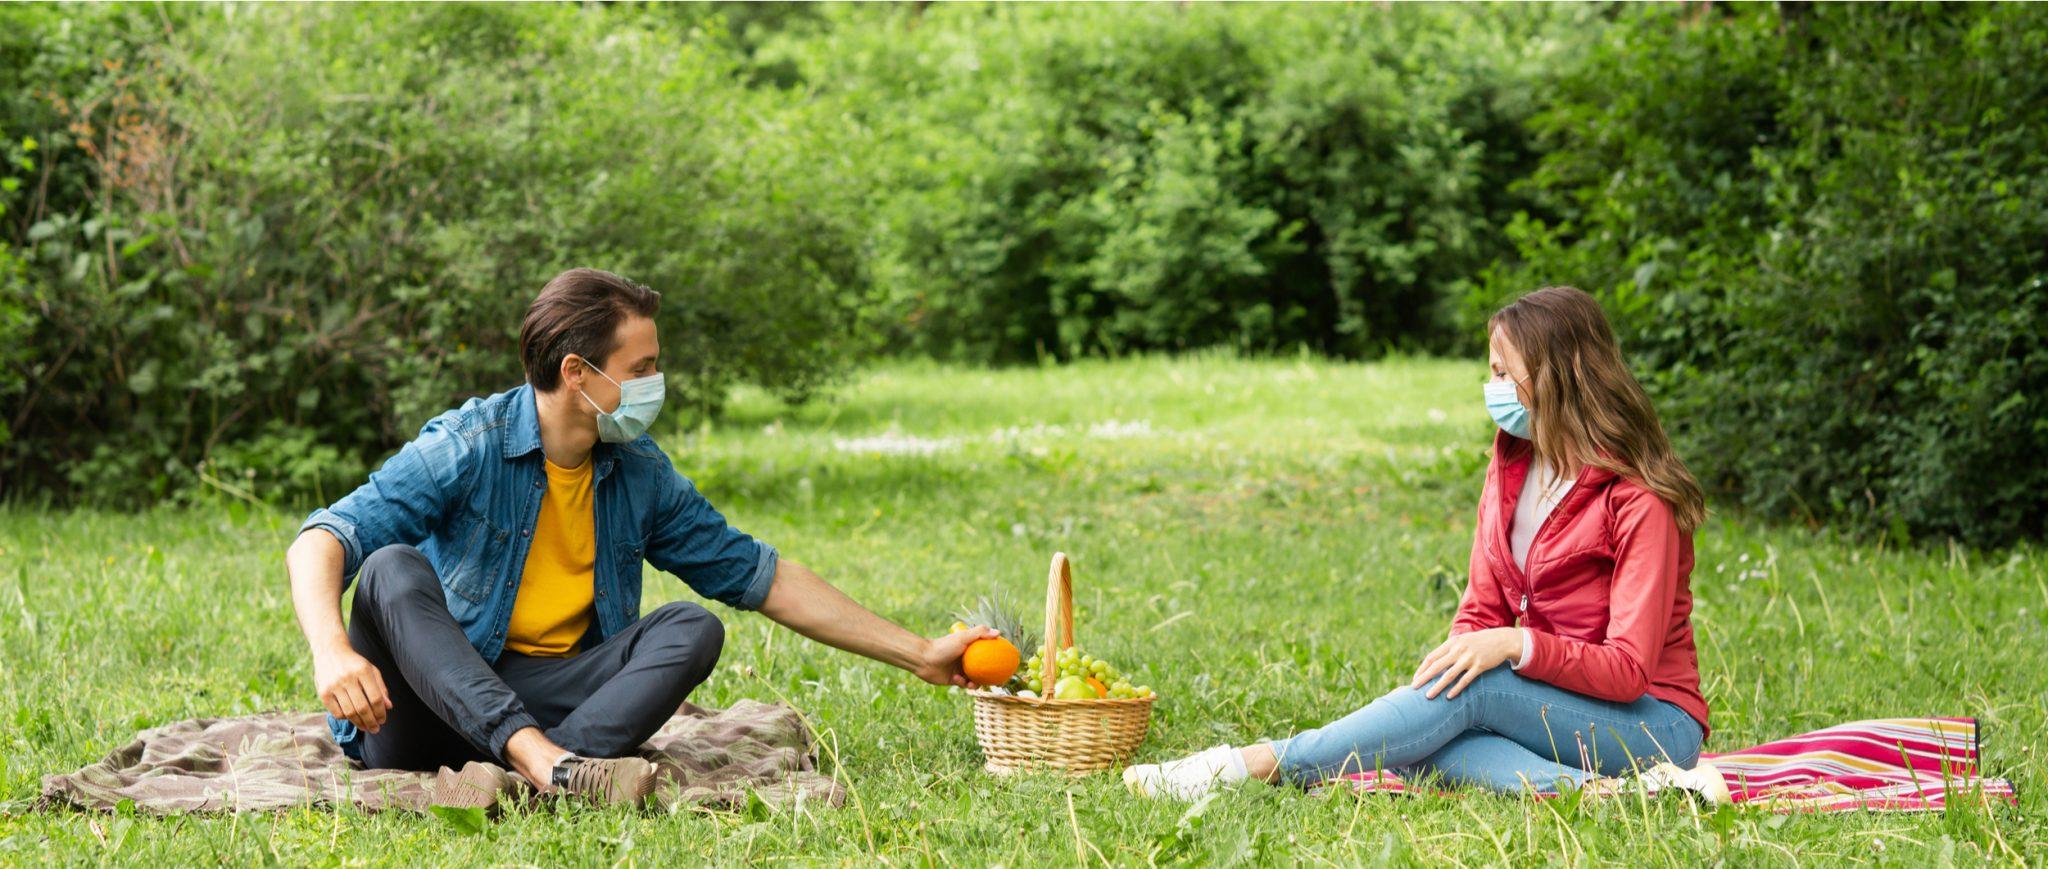 Romantic picnic ideas suggestions